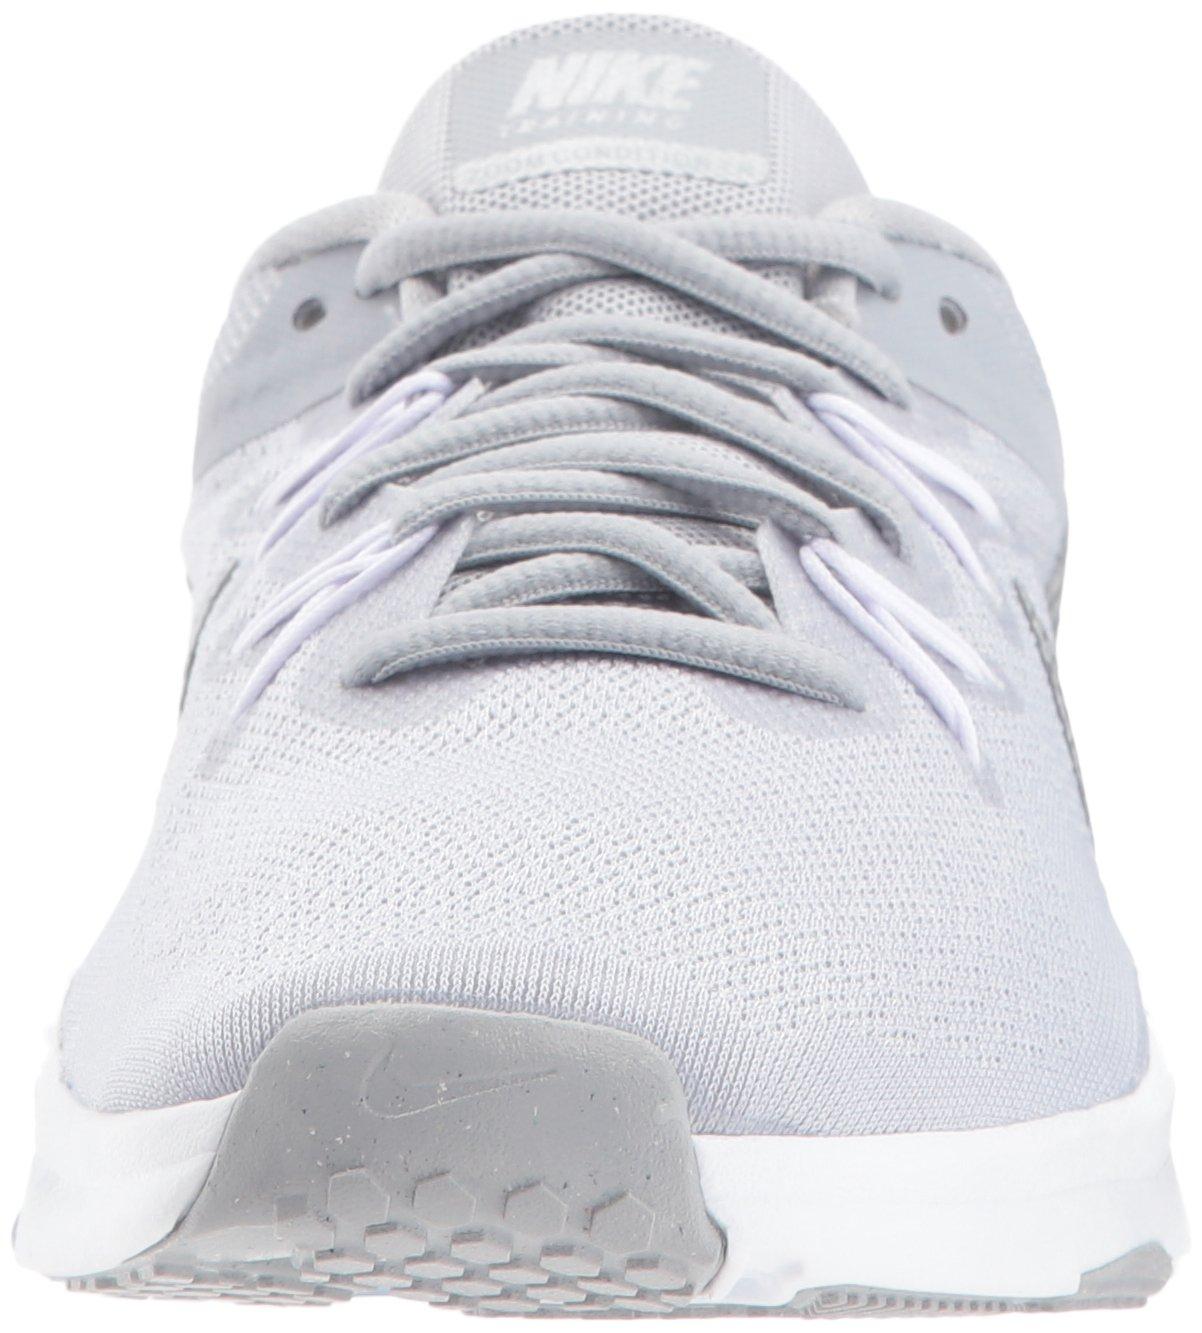 NIKE Women's Zoom Condition 2 Cross Trainer B0719QJJTX 11 B(M) US|Wolf Grey/Metallic Silver - White